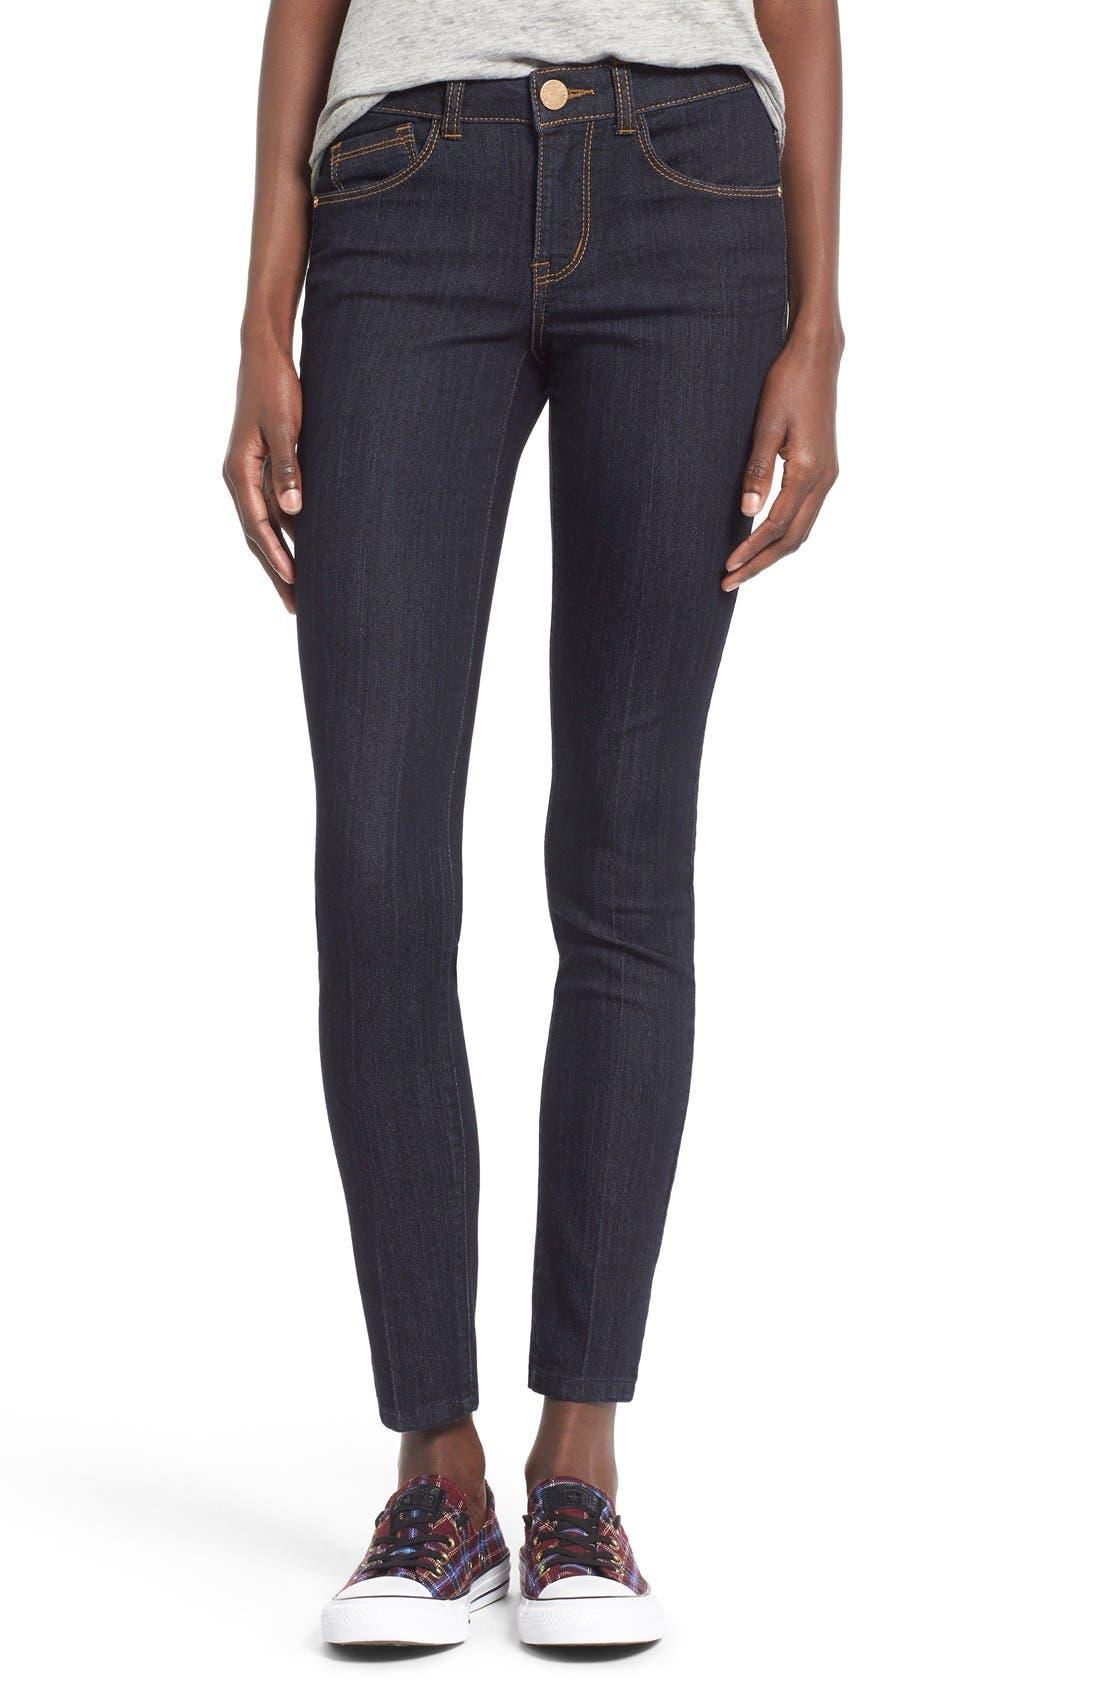 Alternate Image 1 Selected - Jolt Skinny Jeans (Indigo)